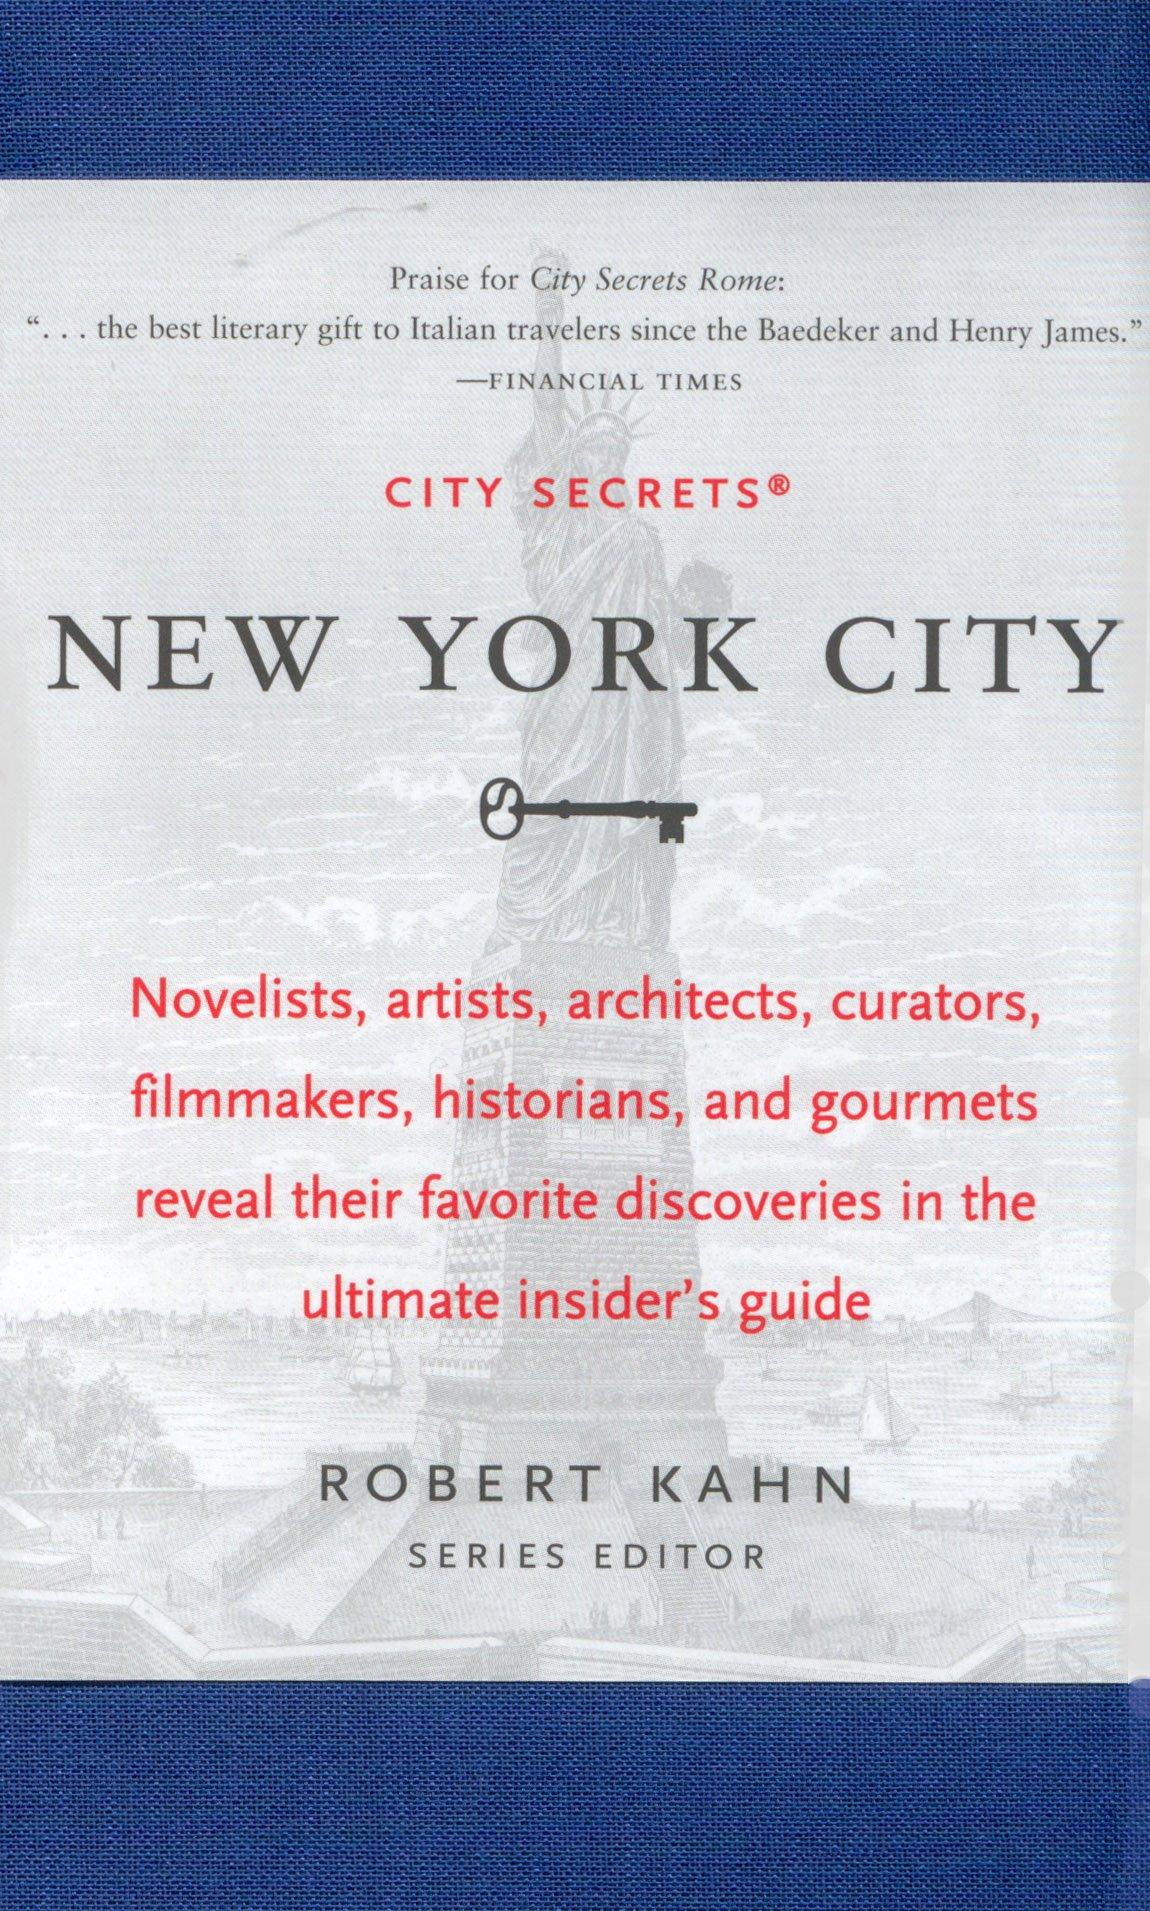 City Secrets New York City